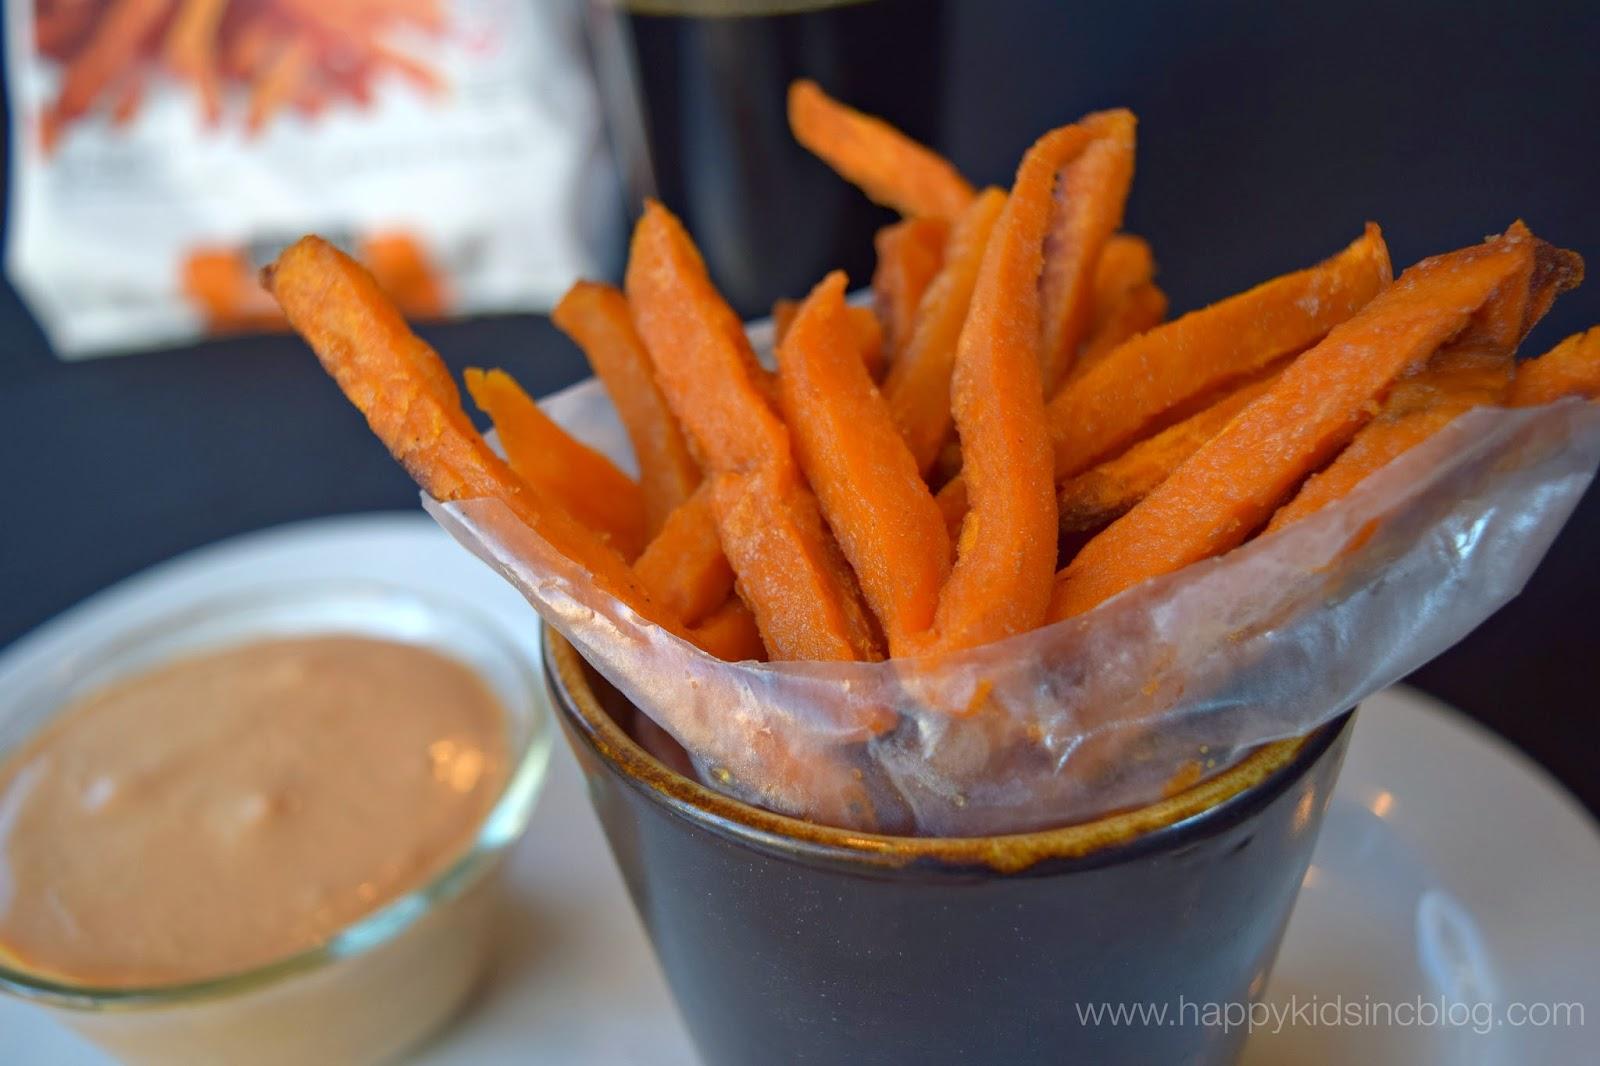 Alexia Foods Sweet Potato Fries Onion Rings Creamy Chipotle Dip recipe